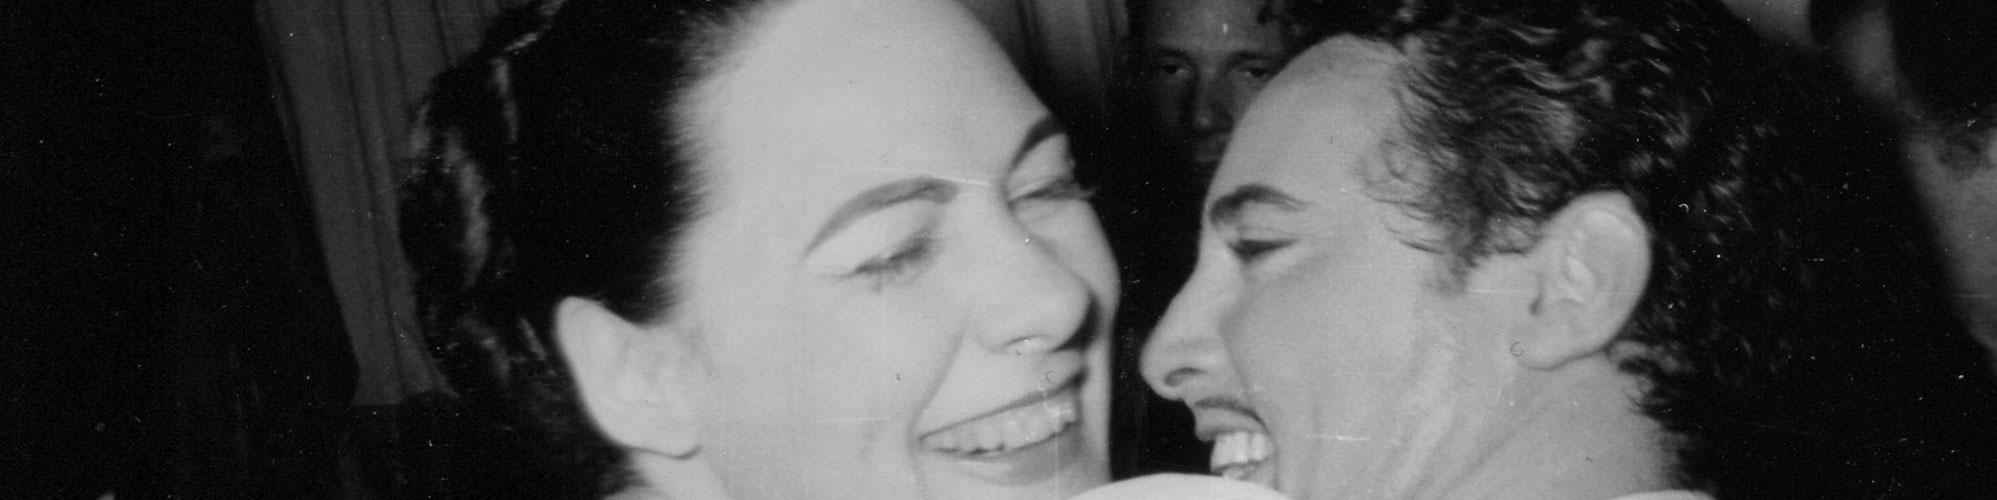 Renata Tebaldi - Mario Del Monaco, Tosca Metropolitan New York 1958